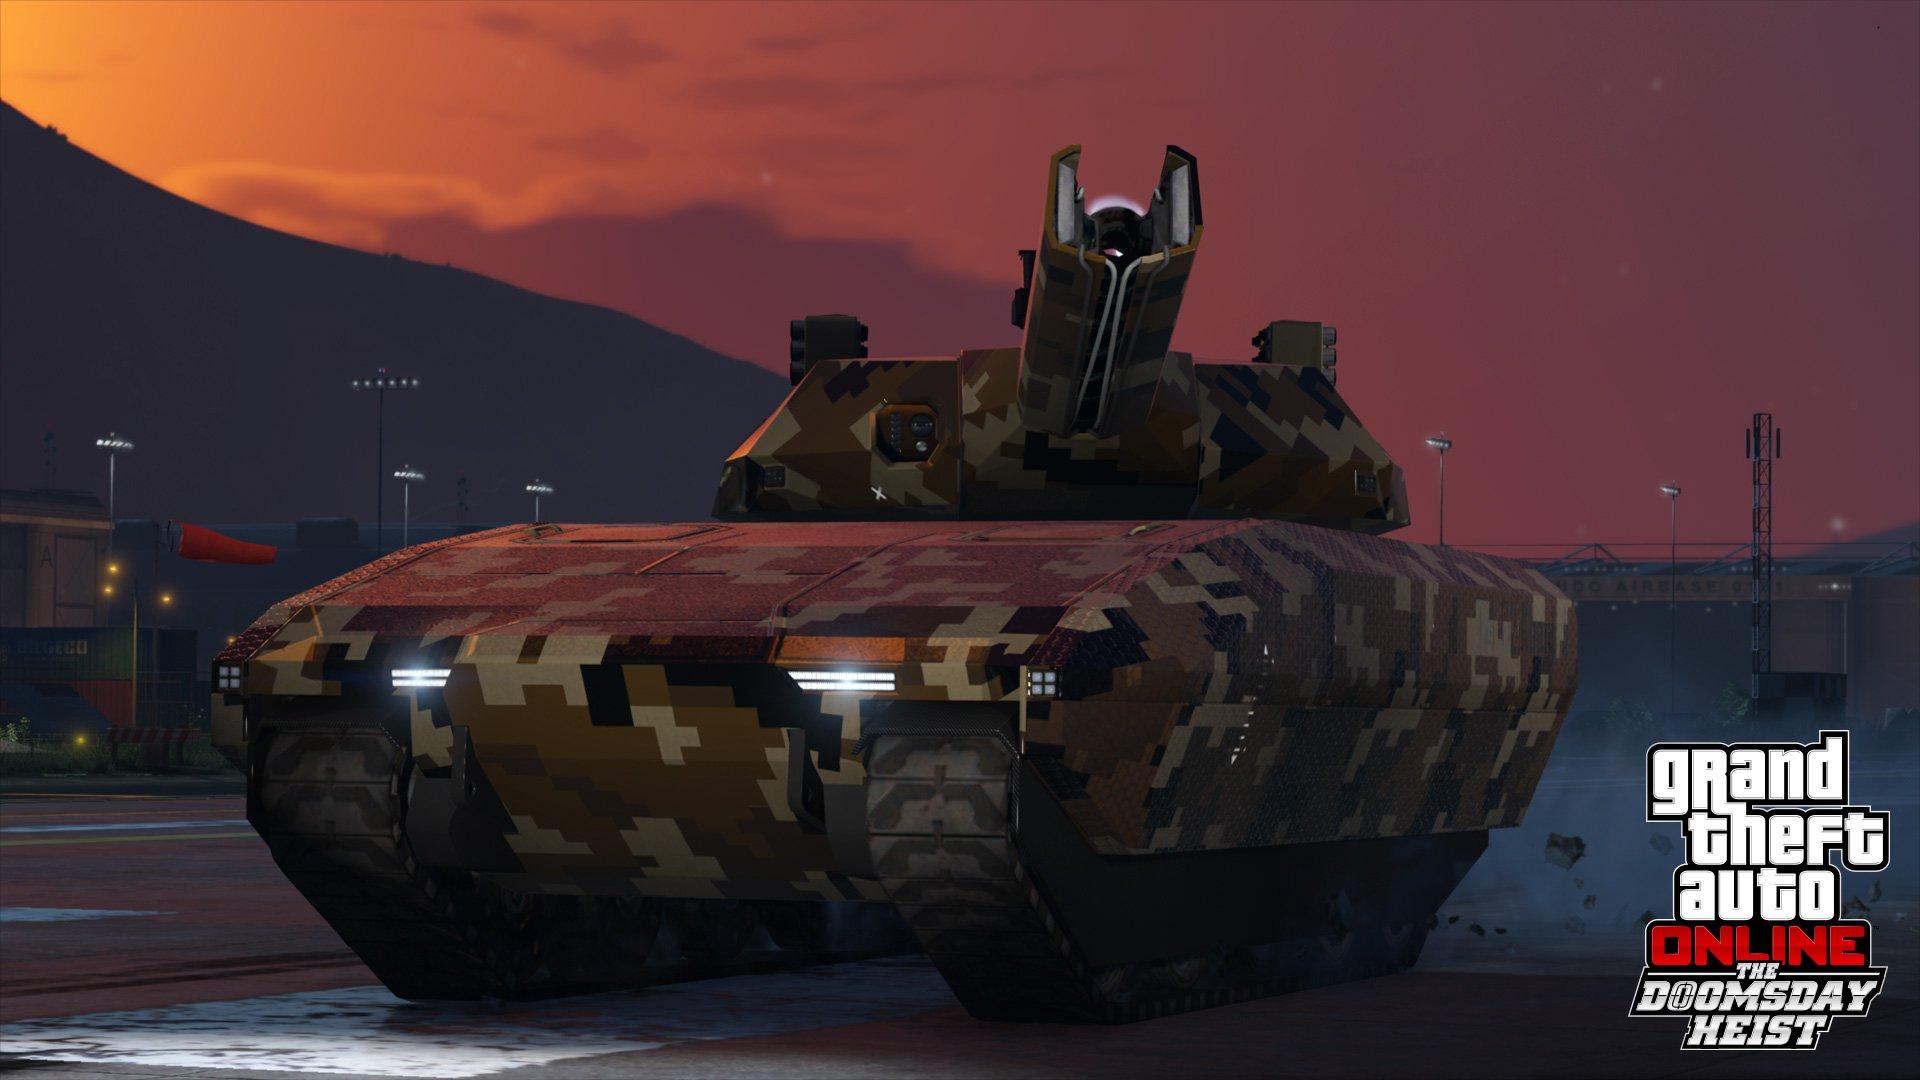 Grand Theft Auto V, GTA 5 11